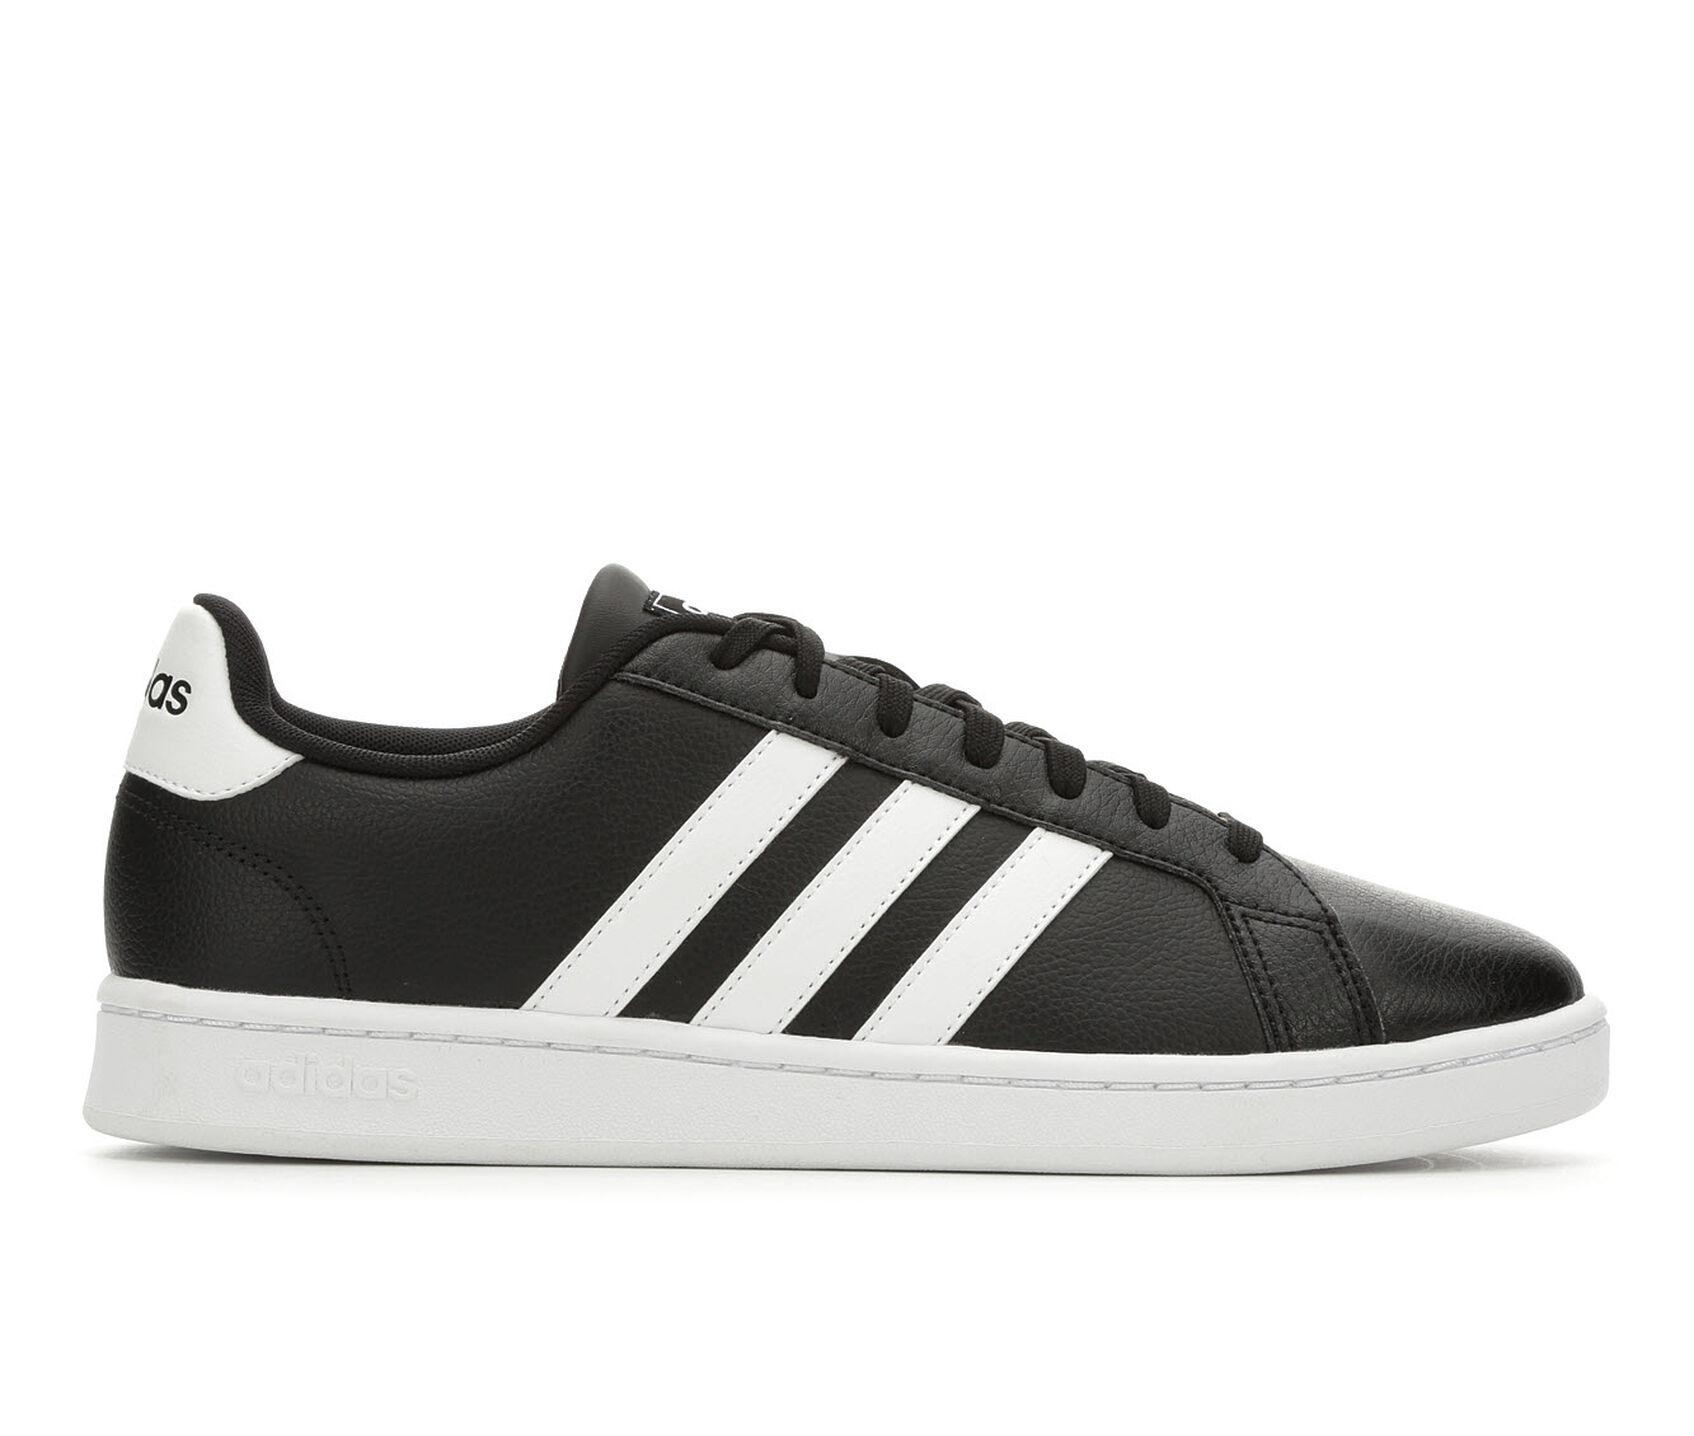 buy popular 2b502 d5b0b ... Adidas Grand Court Retro Sneakers. Previous